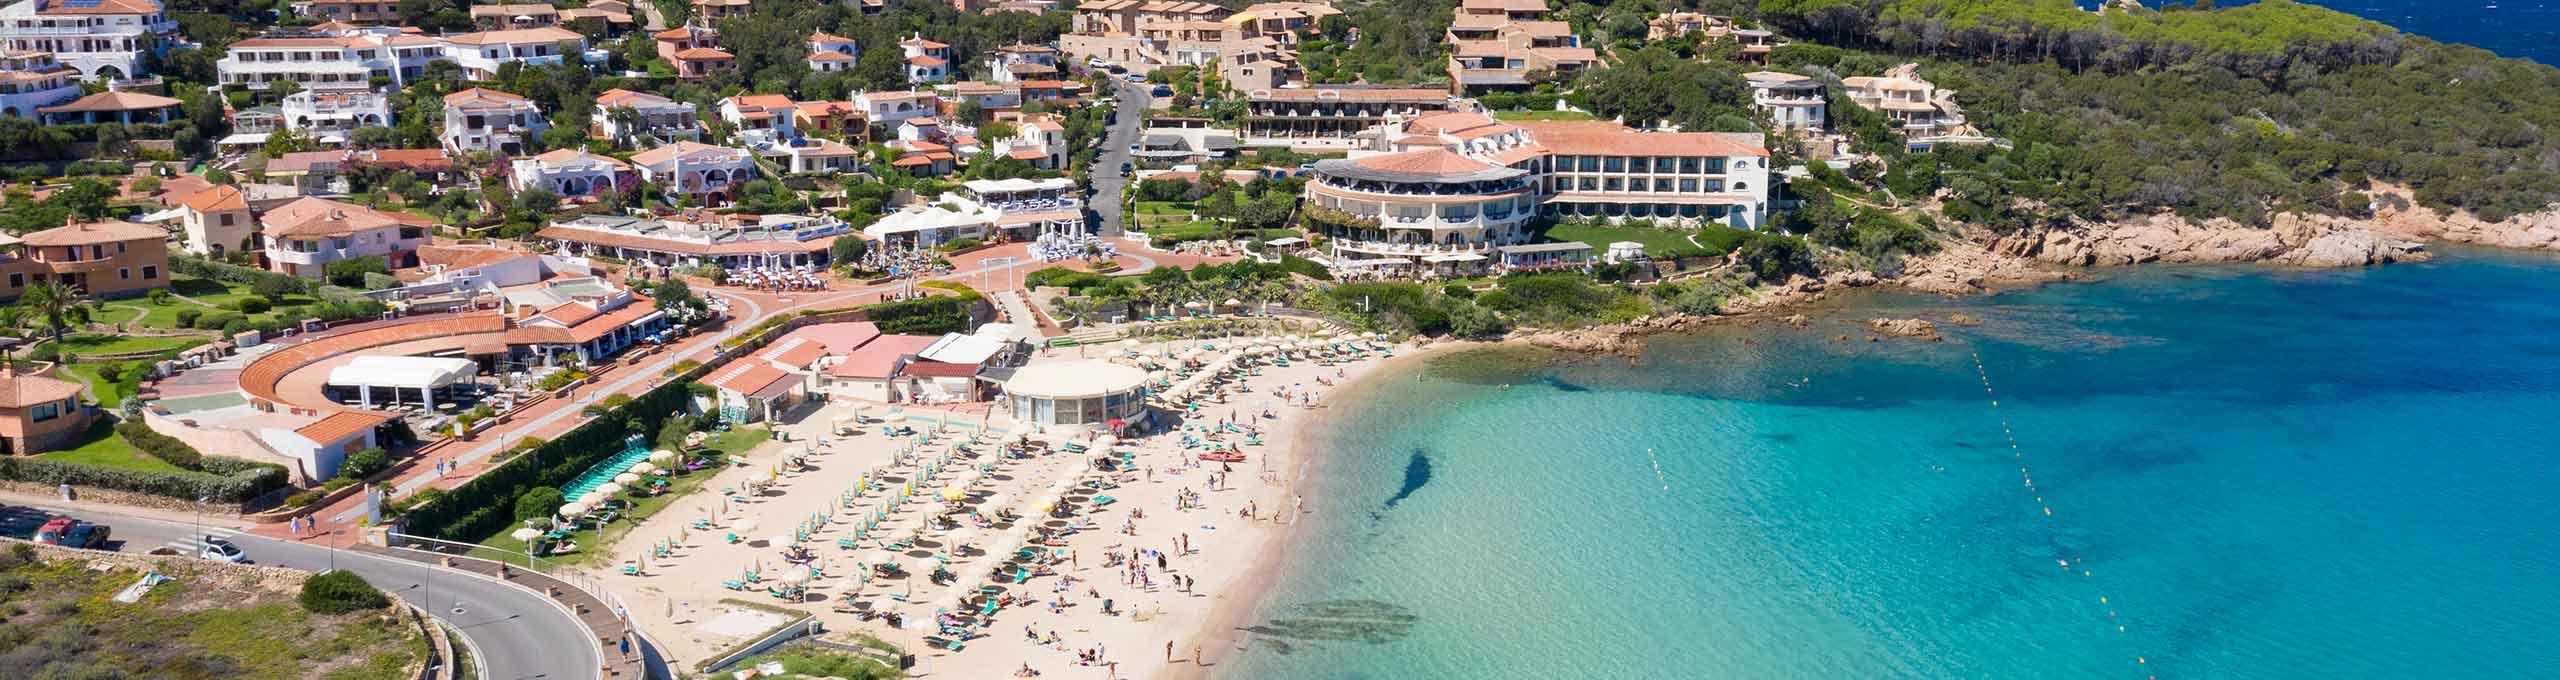 Baja Sardinia, Costa Smeralda